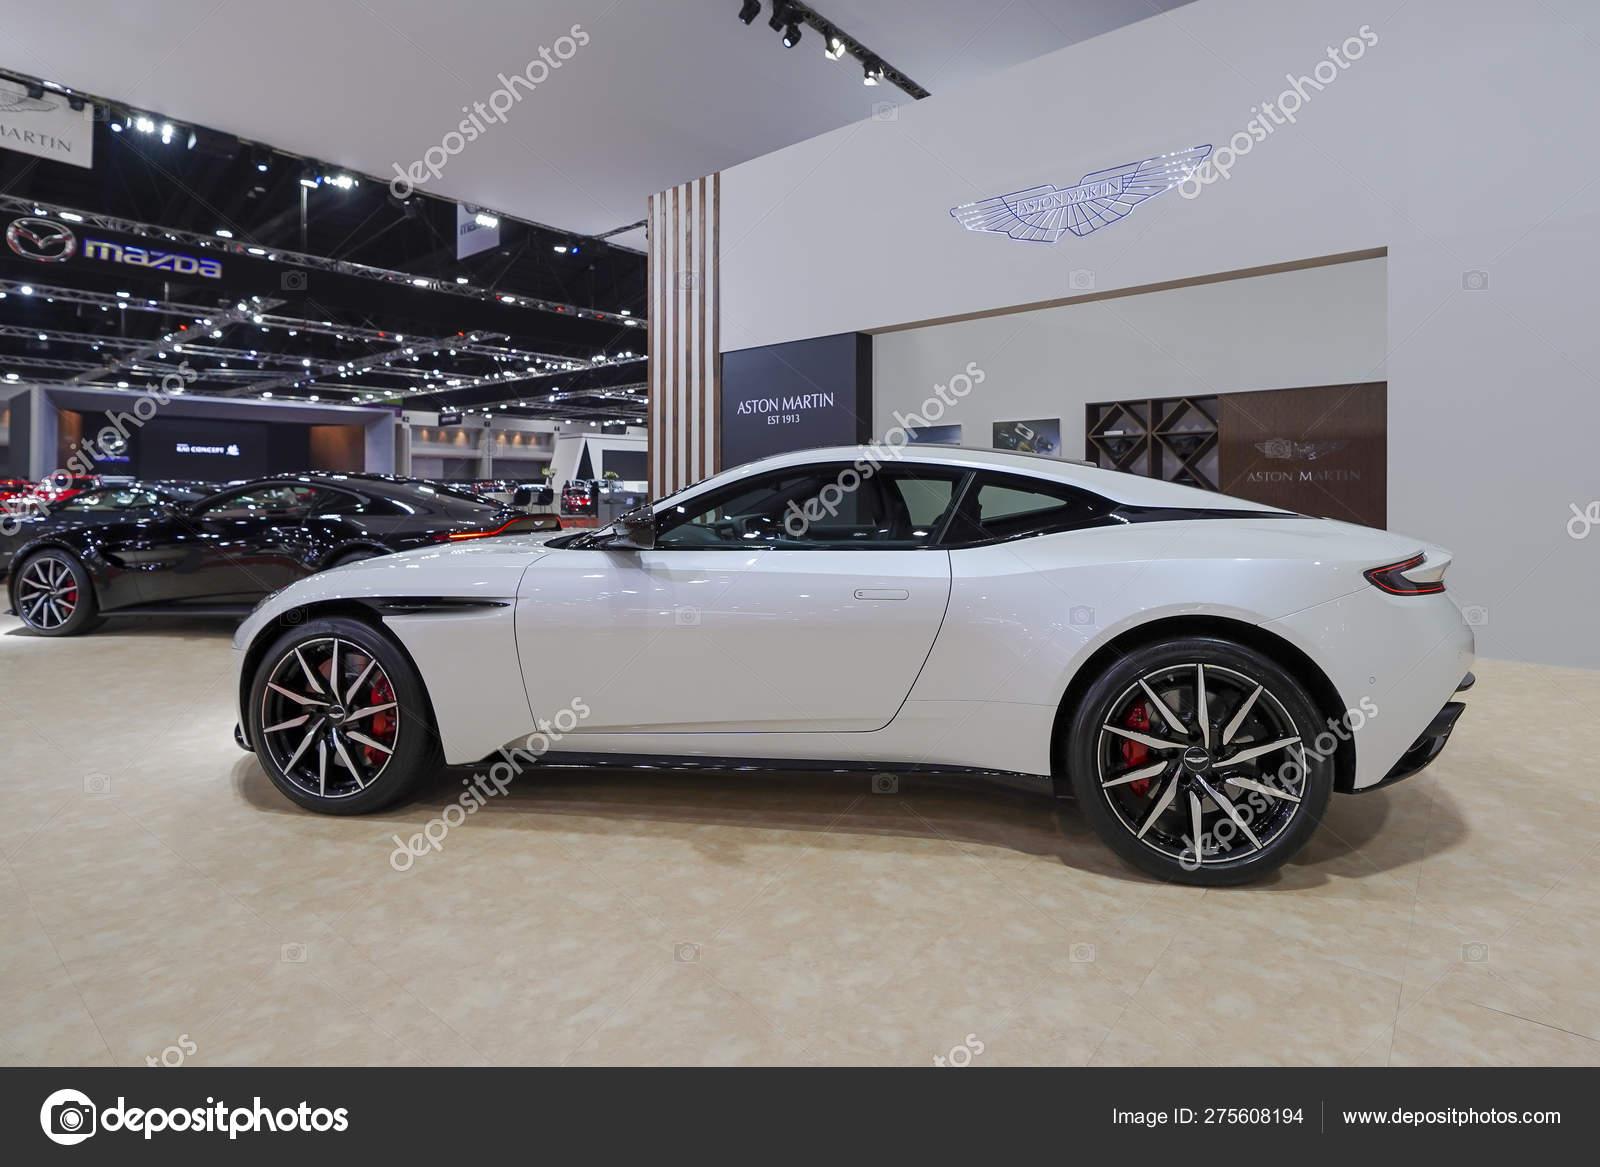 Bangkok Thailand March 2019 Aston Martin Db11 Turbo Coupe White Stock Editorial Photo C Pomphotothailand Gmail Com 275608194